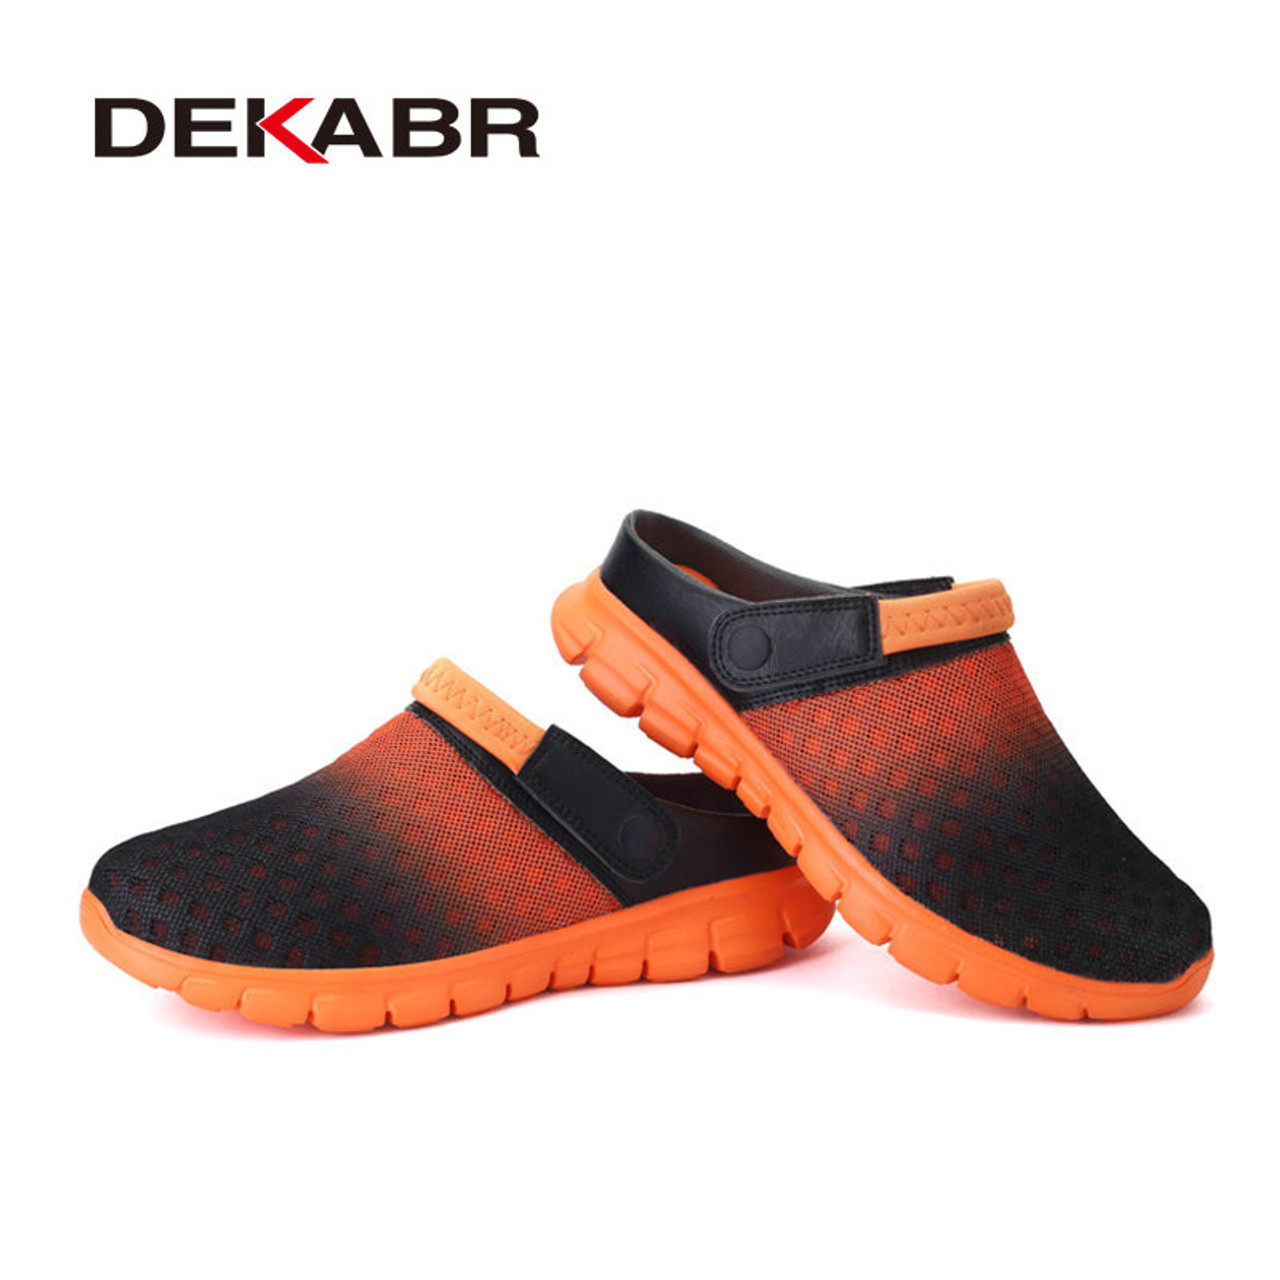 7ce4f08d6d315 ... Big Size 36-46 Men Summer Shoes Sandals New Breathable Beach Flip Flops  Slip On ...